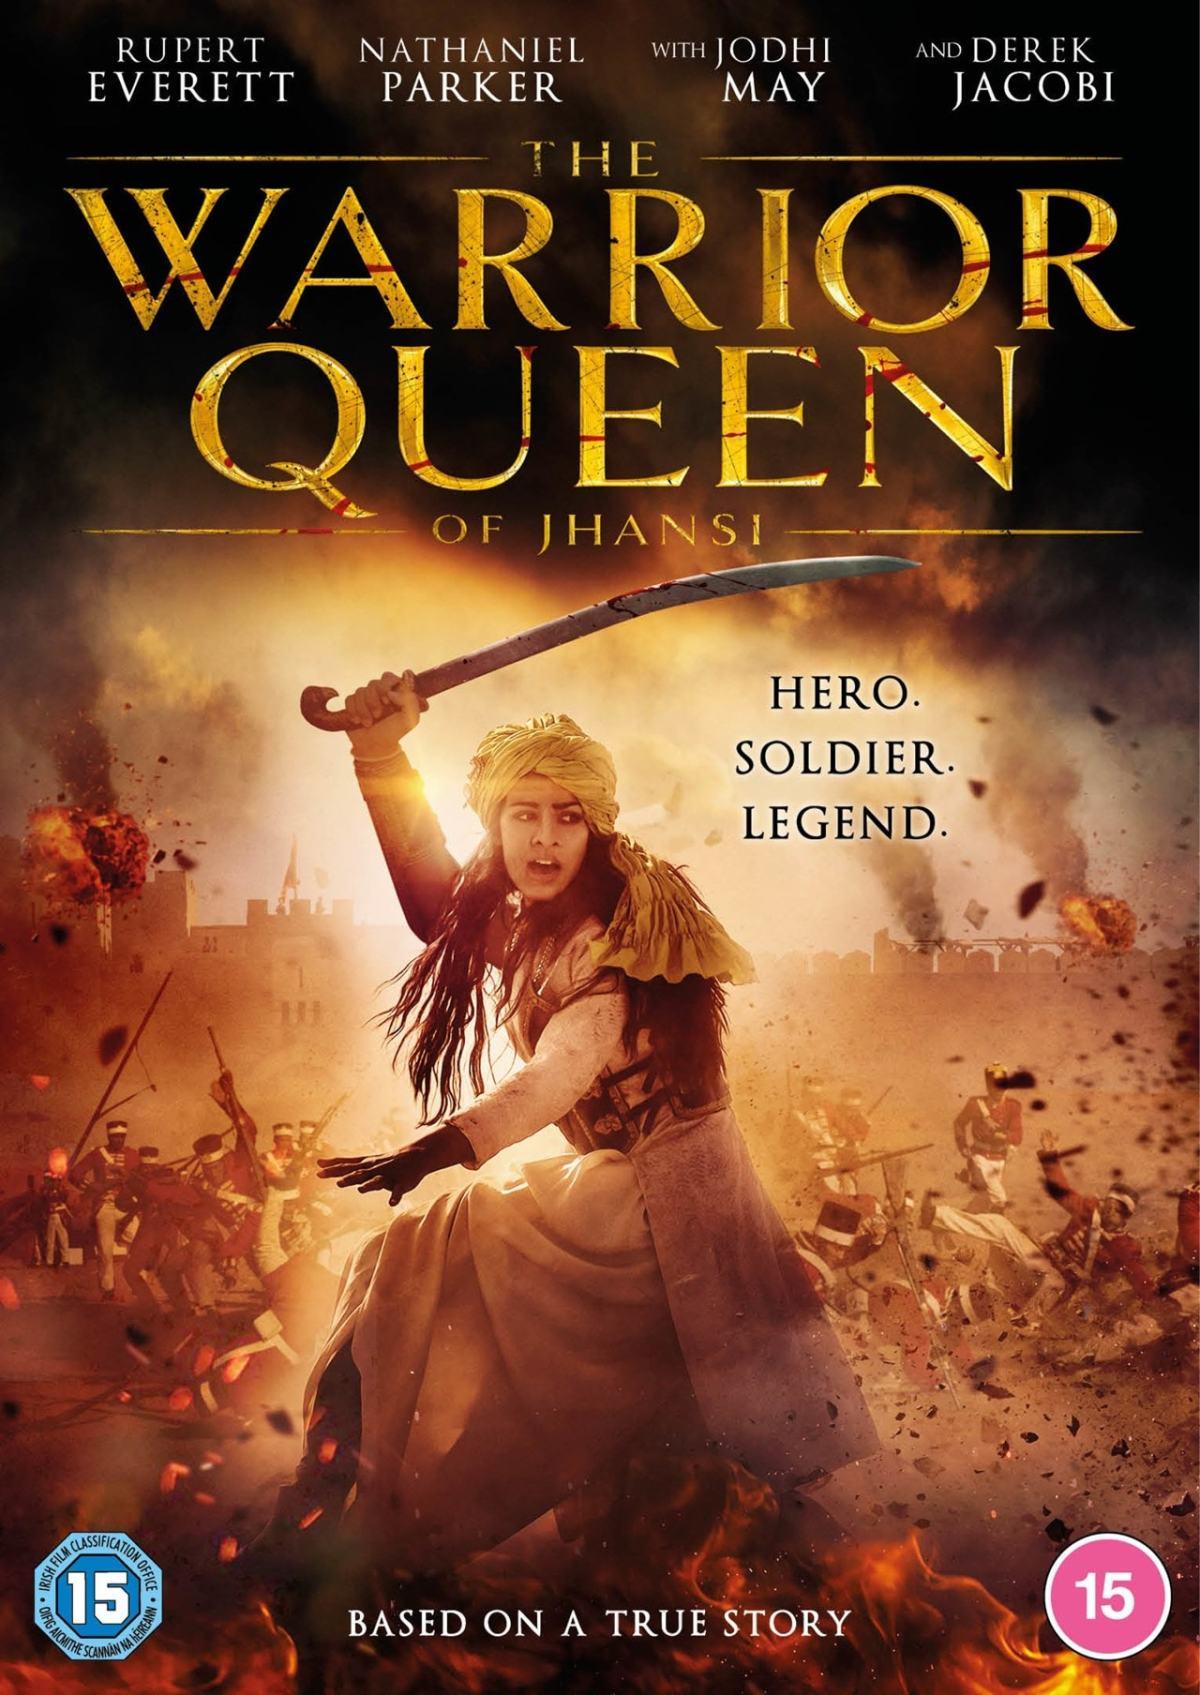 The Warrior Queen ofJhansi